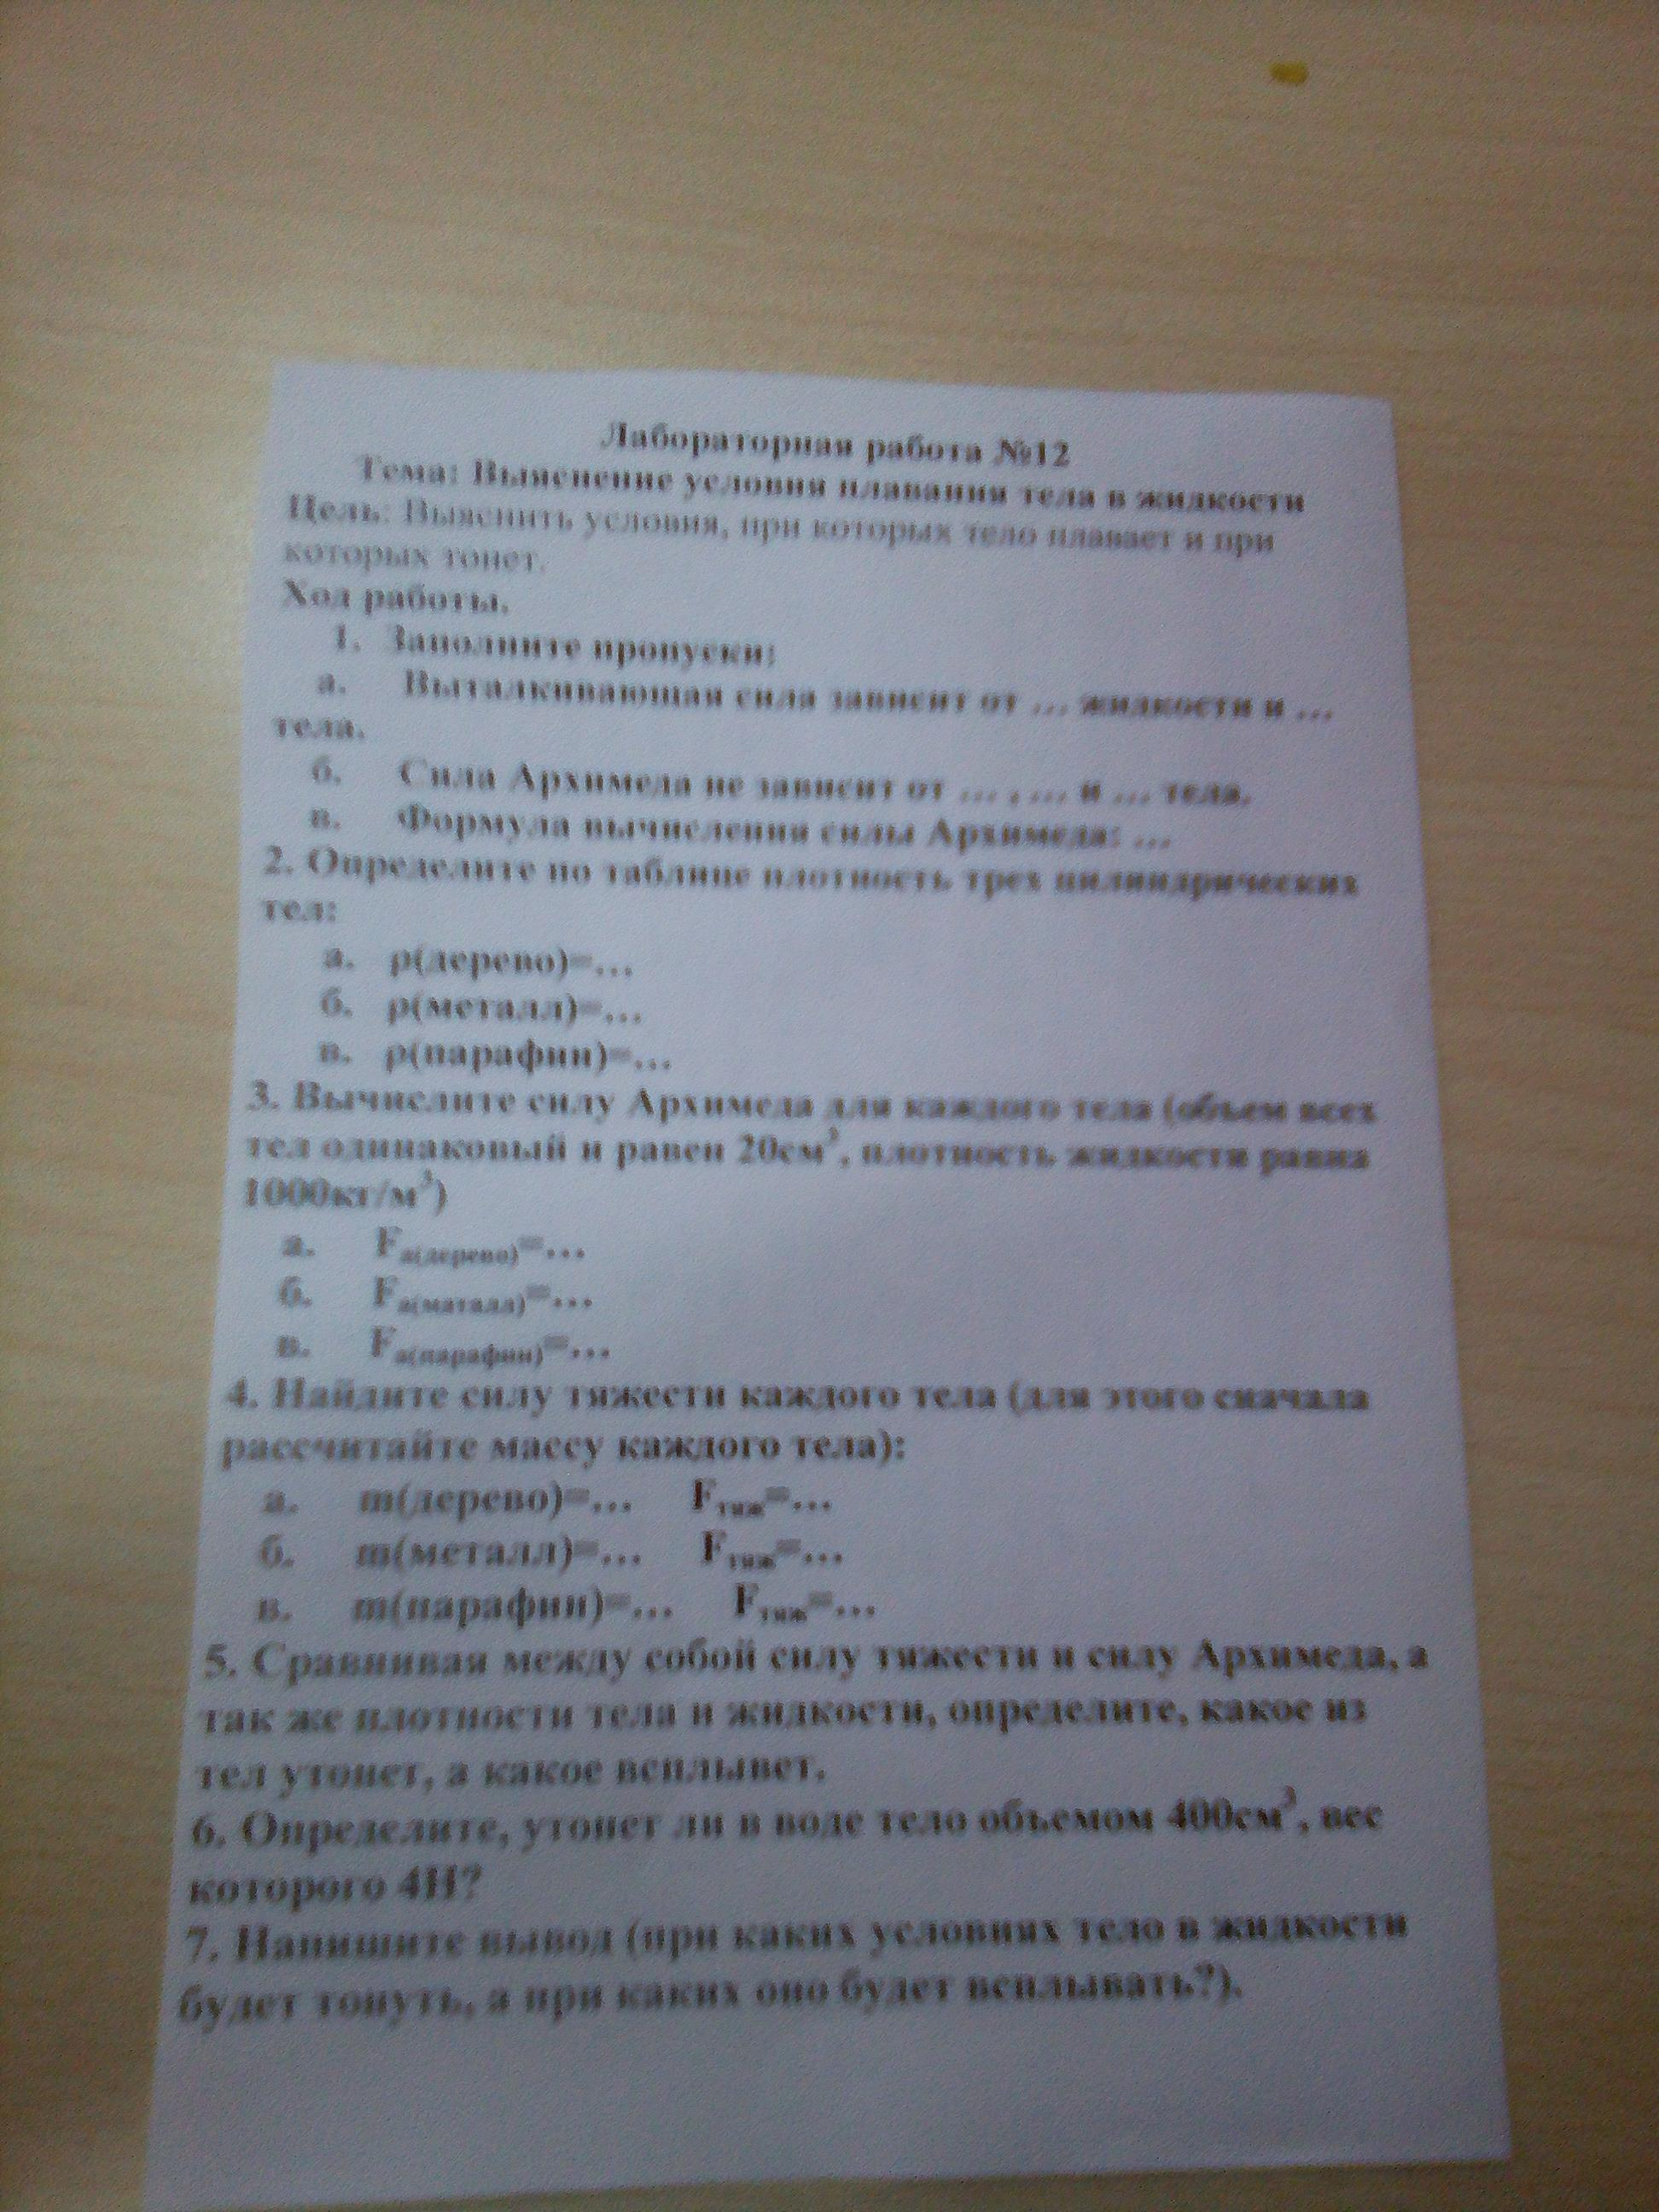 Плиизз, помогите, срочнооооо!! Физика, 7 класс!!